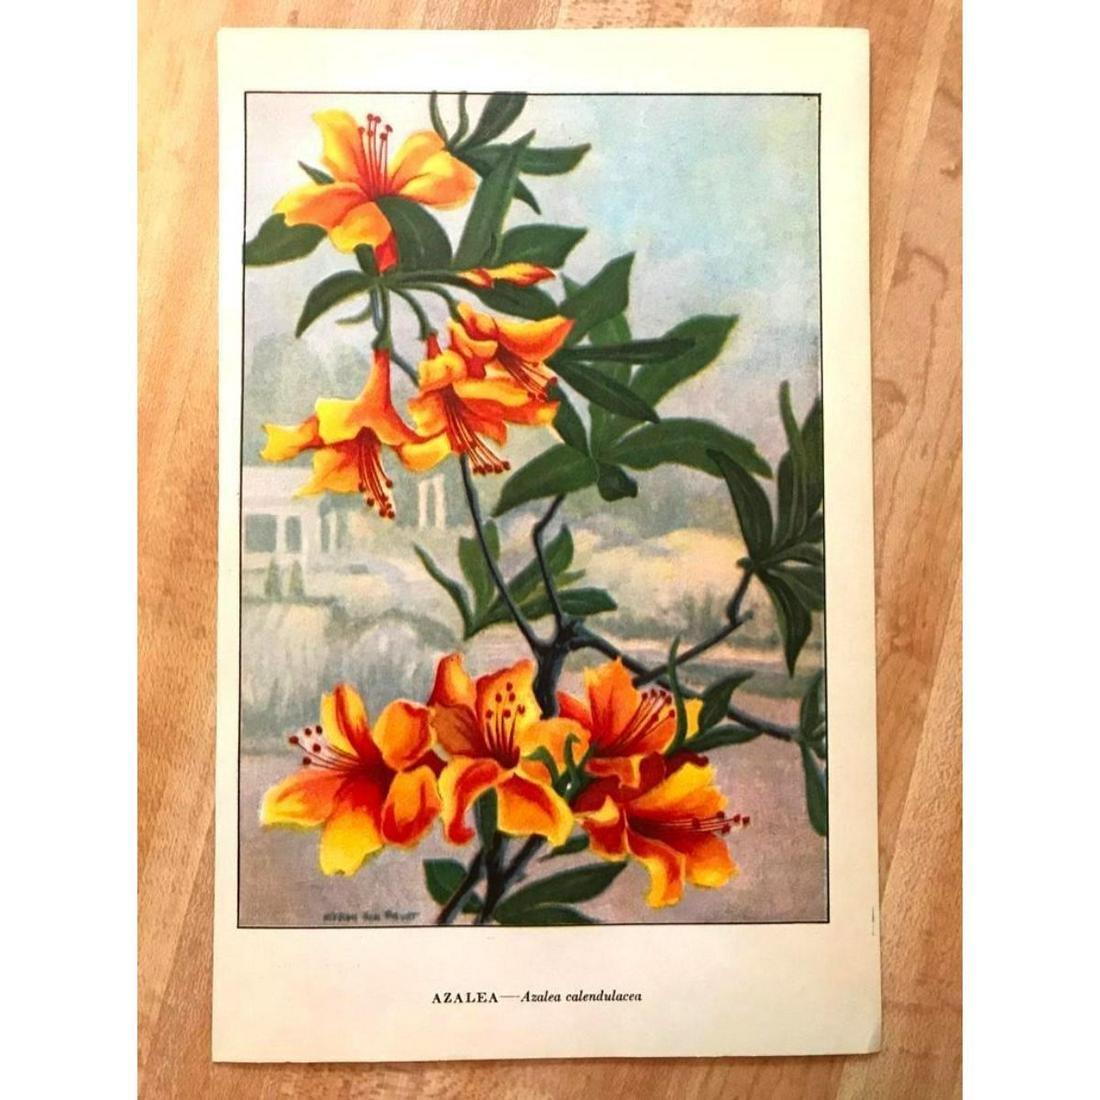 1920's Azalea Color Lithograph Print